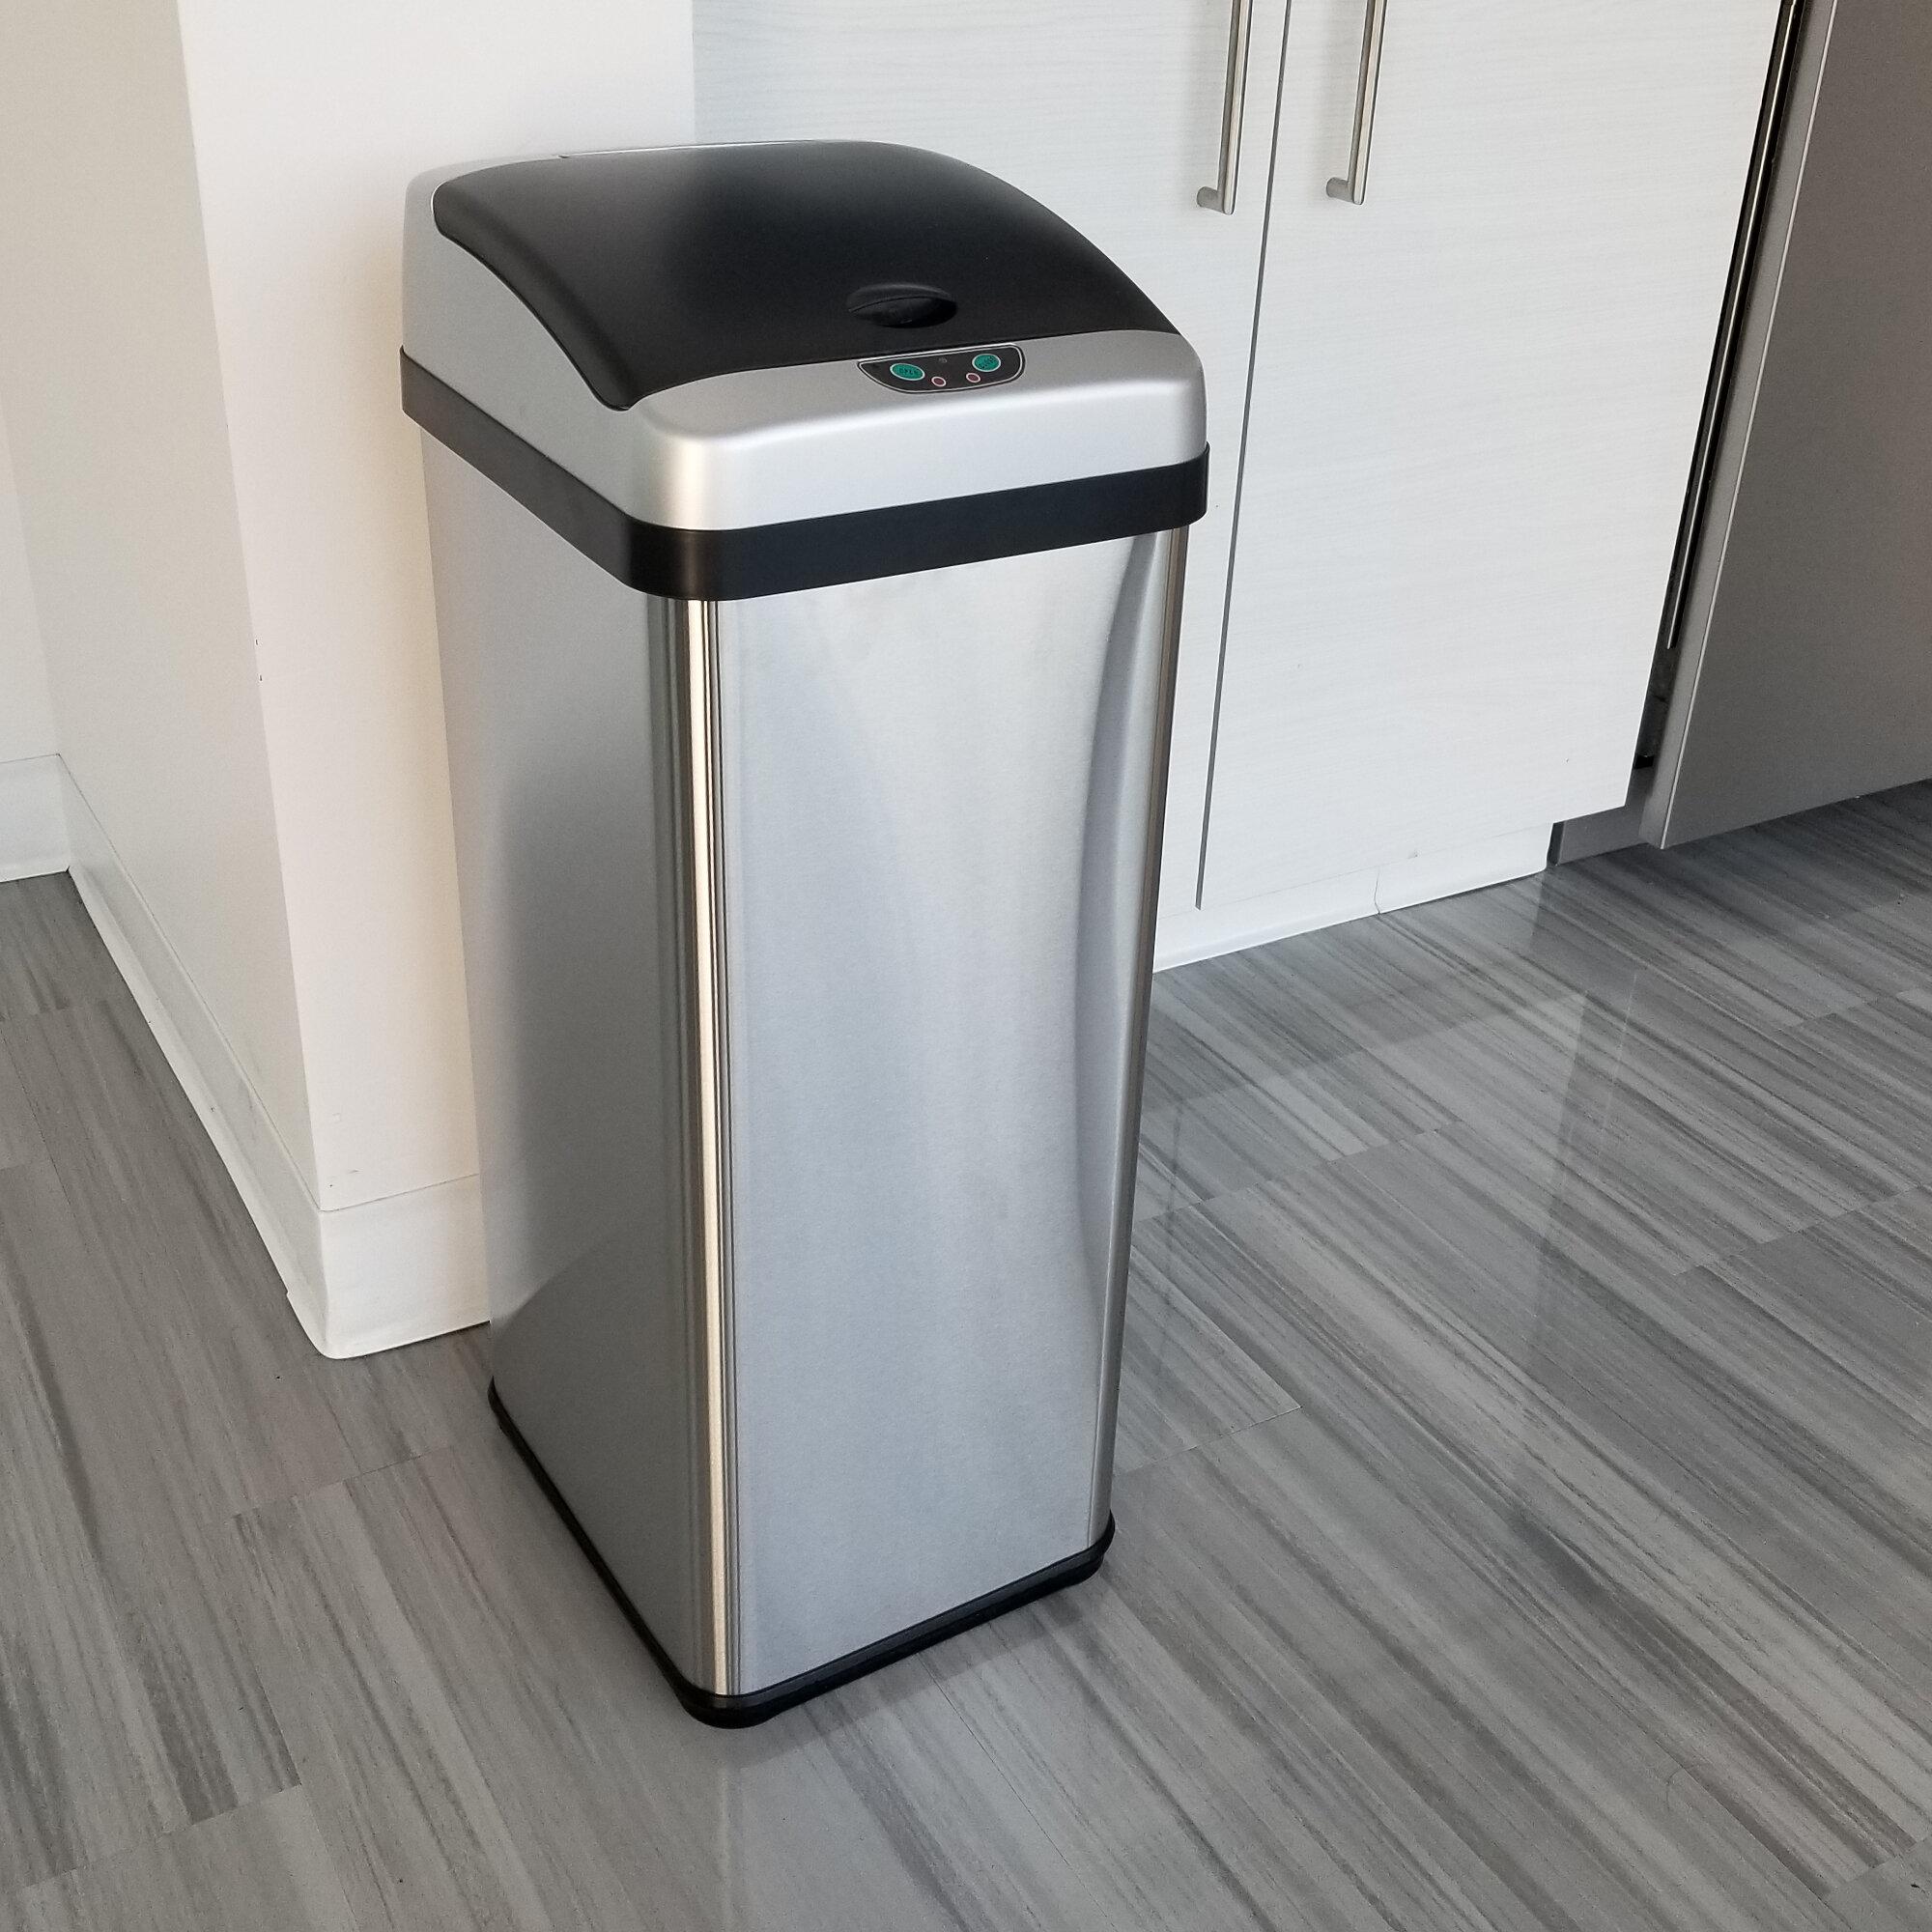 Halo Platinum 13 Gallon Motion Sensor Trash Can Reviews Wayfair